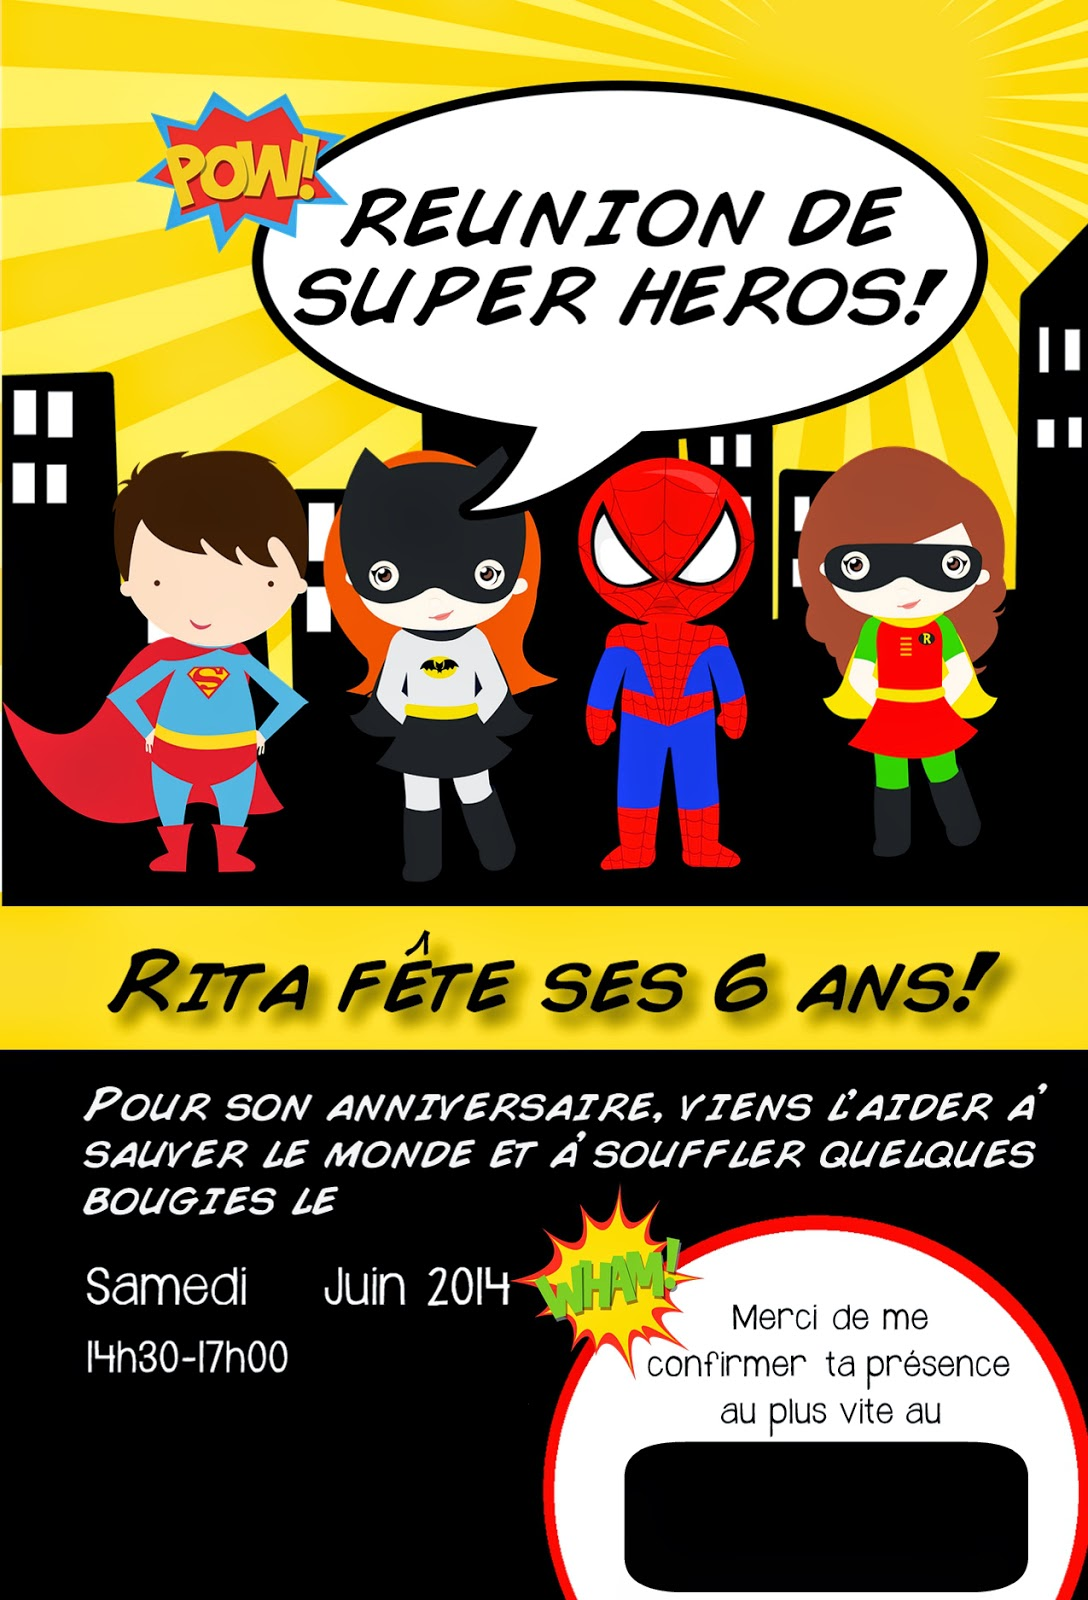 Carte joyeux anniversaire super heros